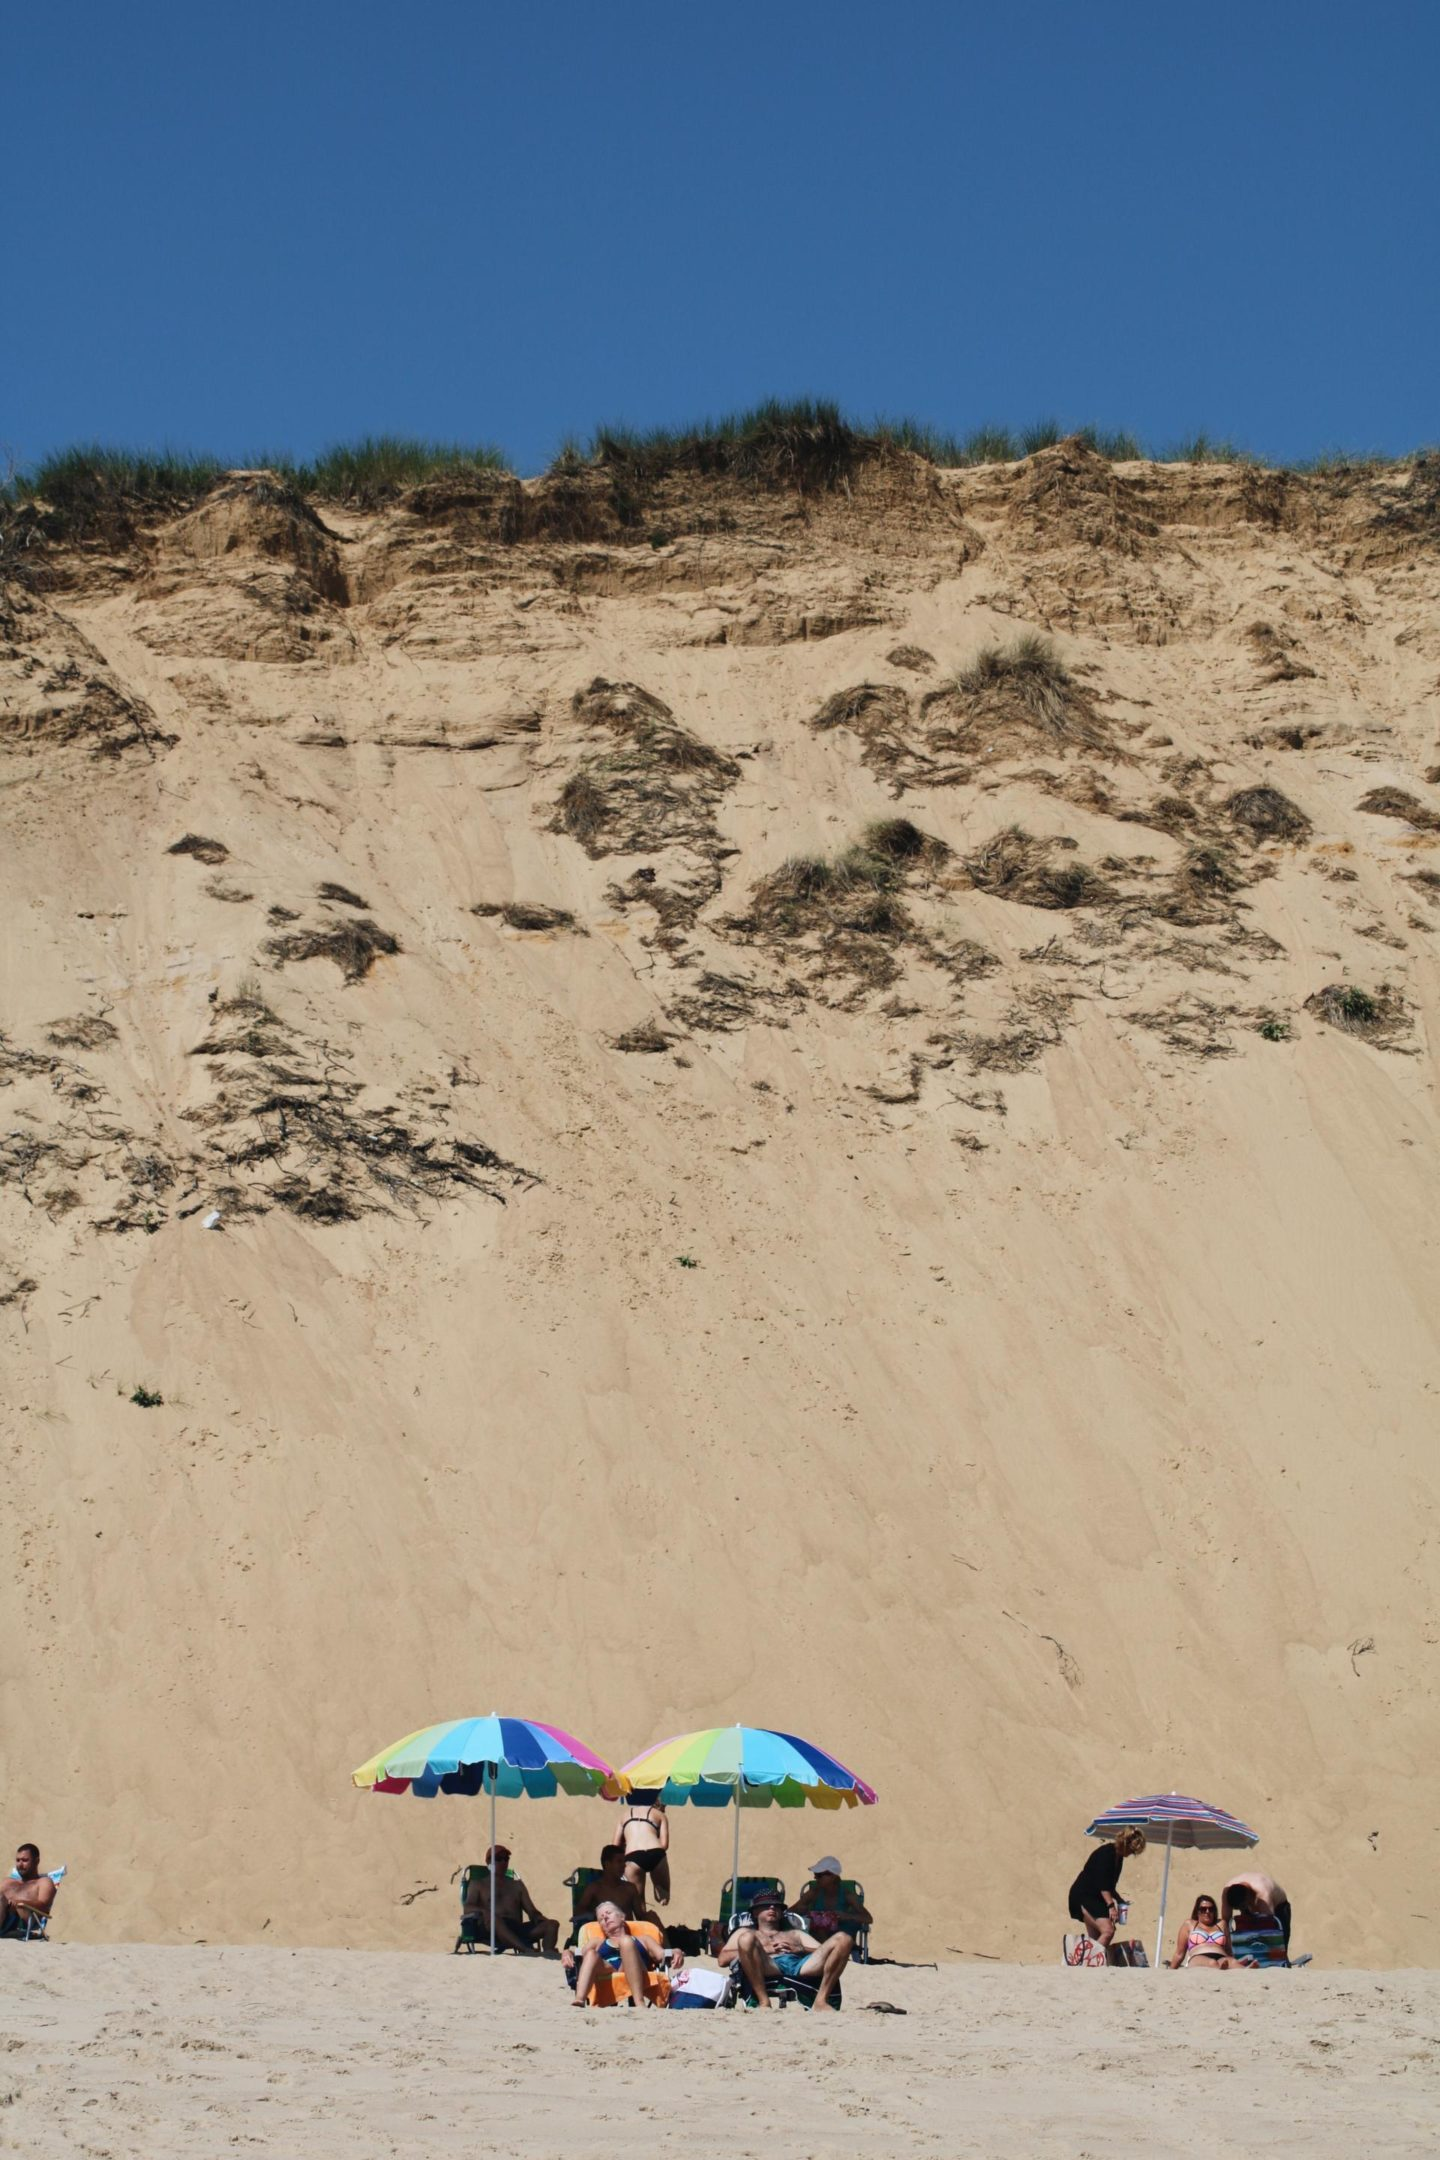 This Season's Gold // Cahoon Hallow Beach, Wellfleet